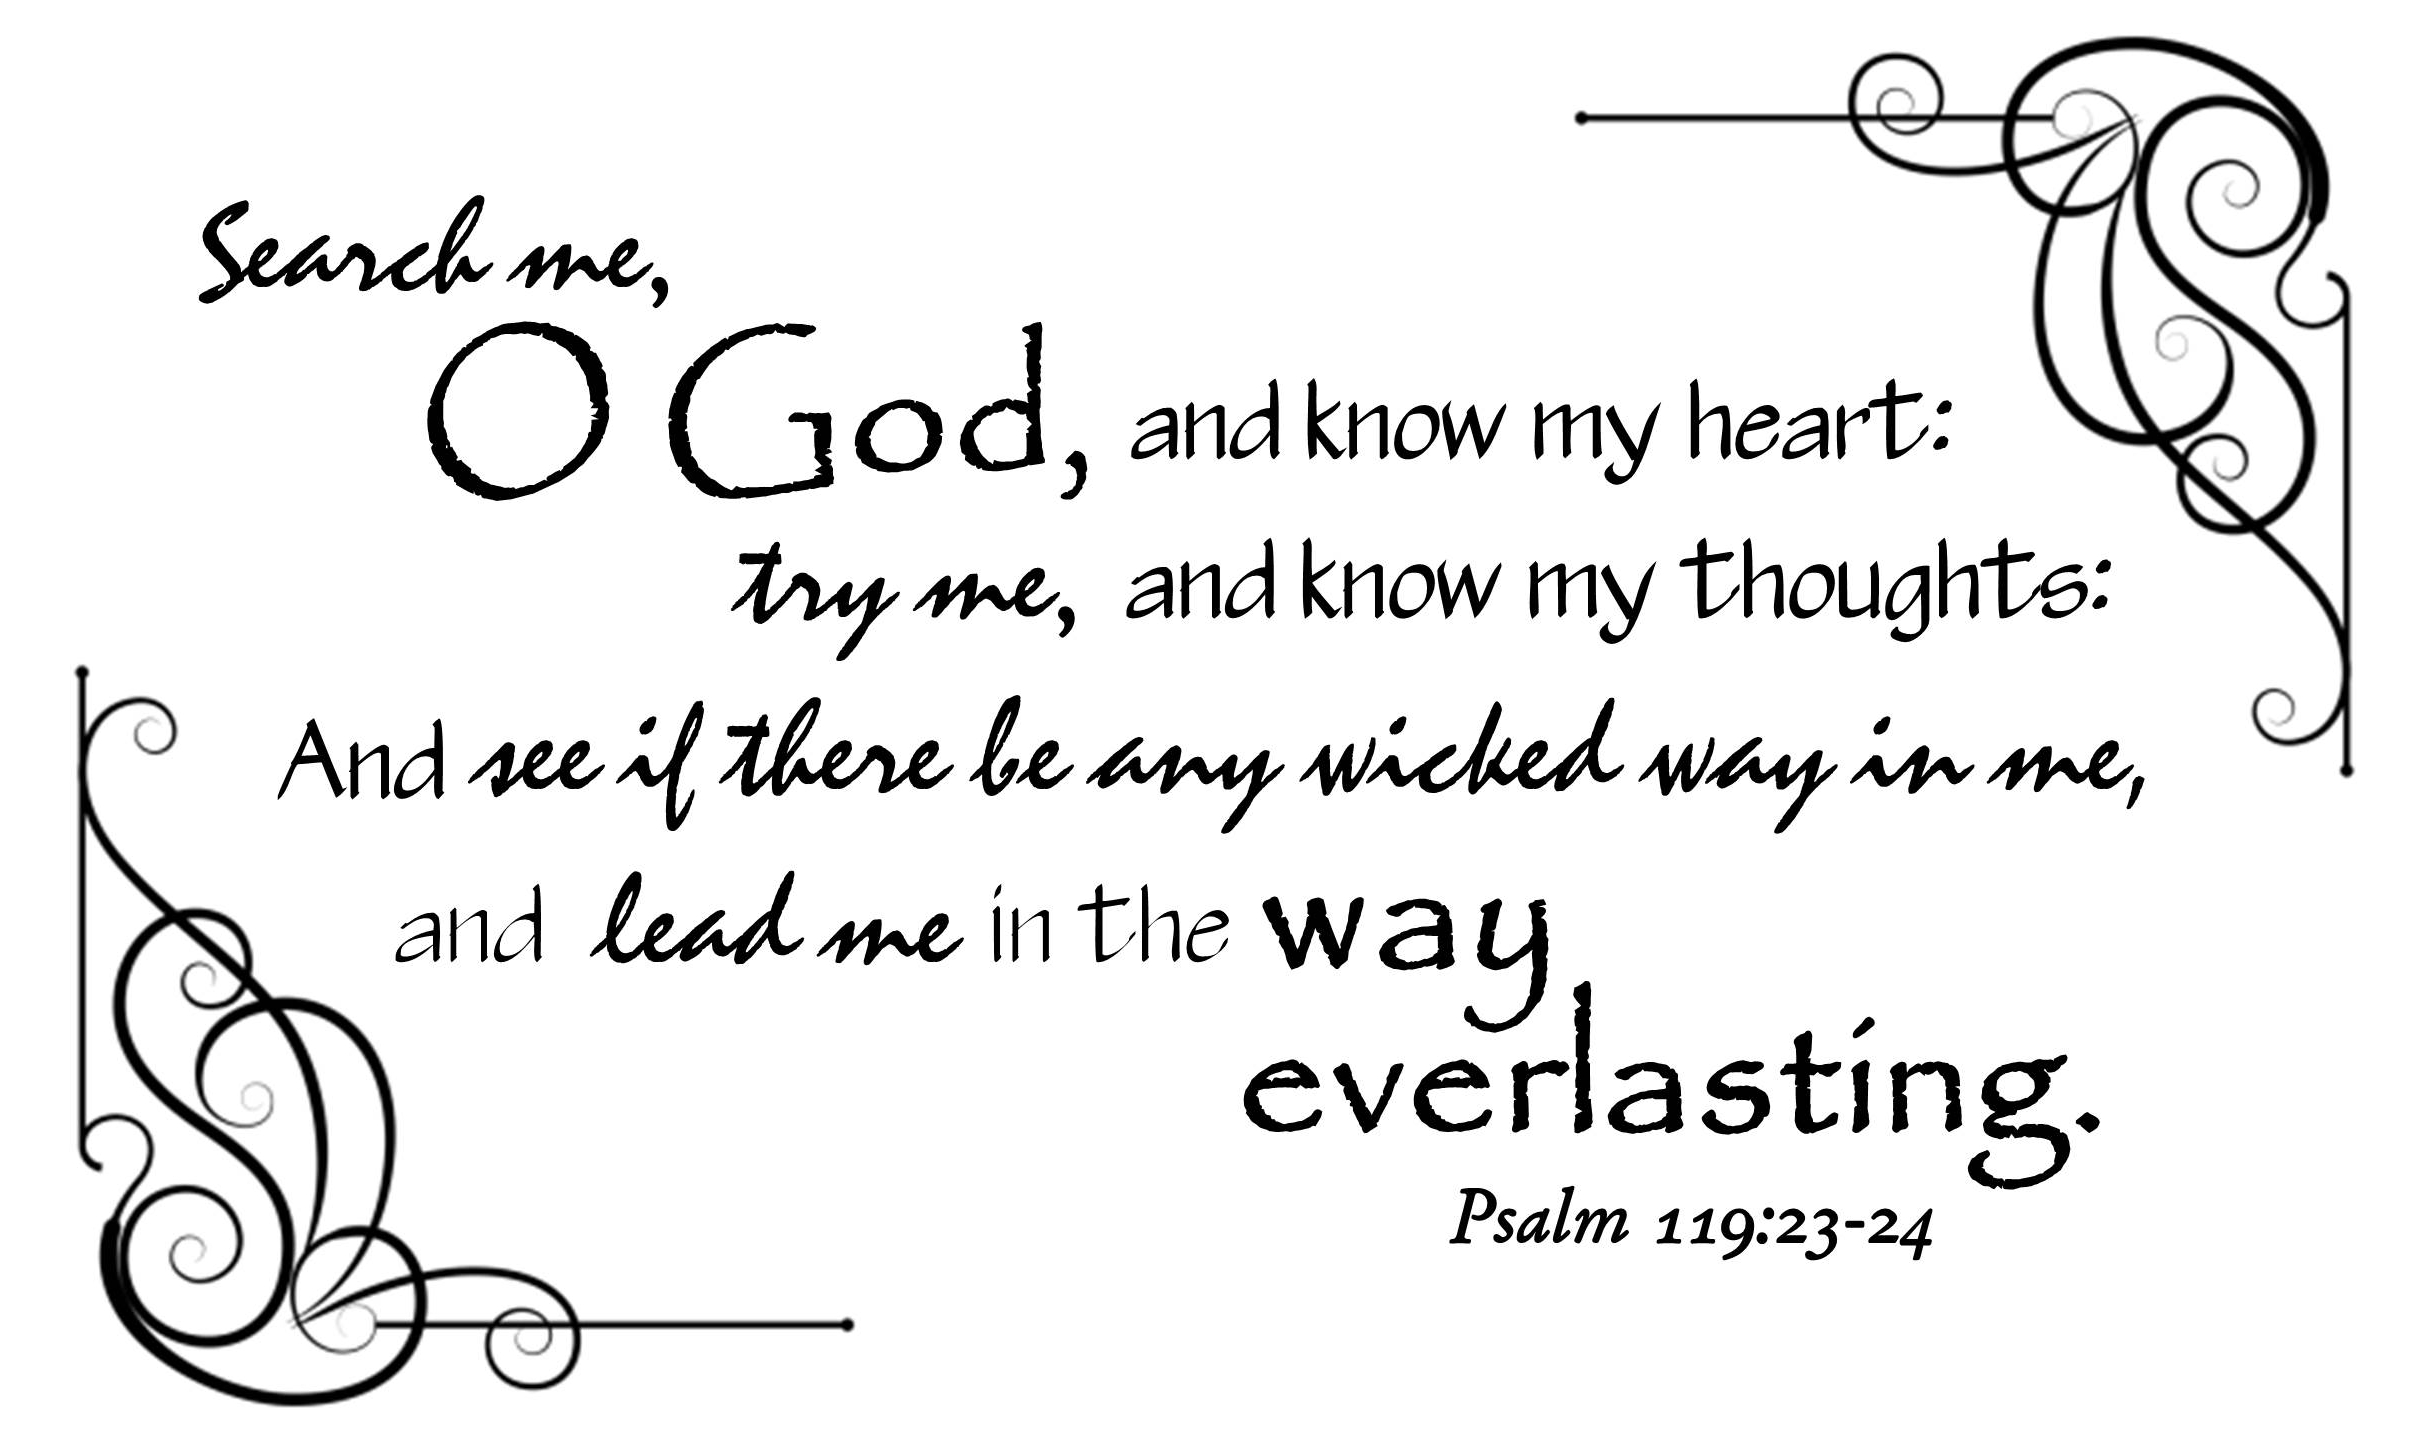 Psalm 119:23-24